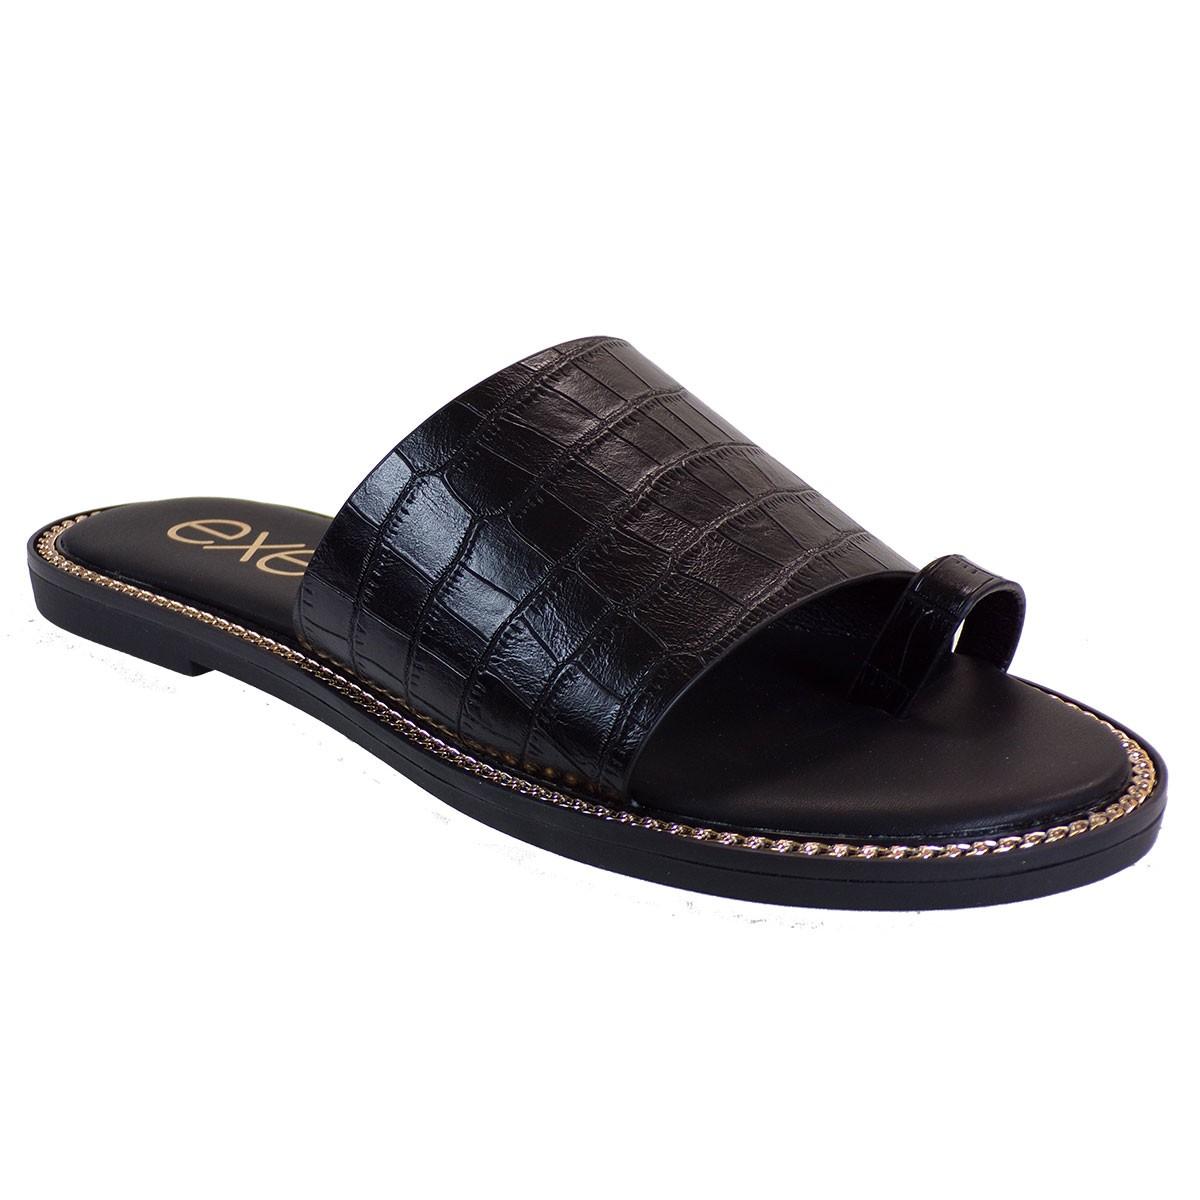 EXE Shoes Γυναικεία Παντόφλας ALEXIA-140 Μαύρο Κροκό M47001401024